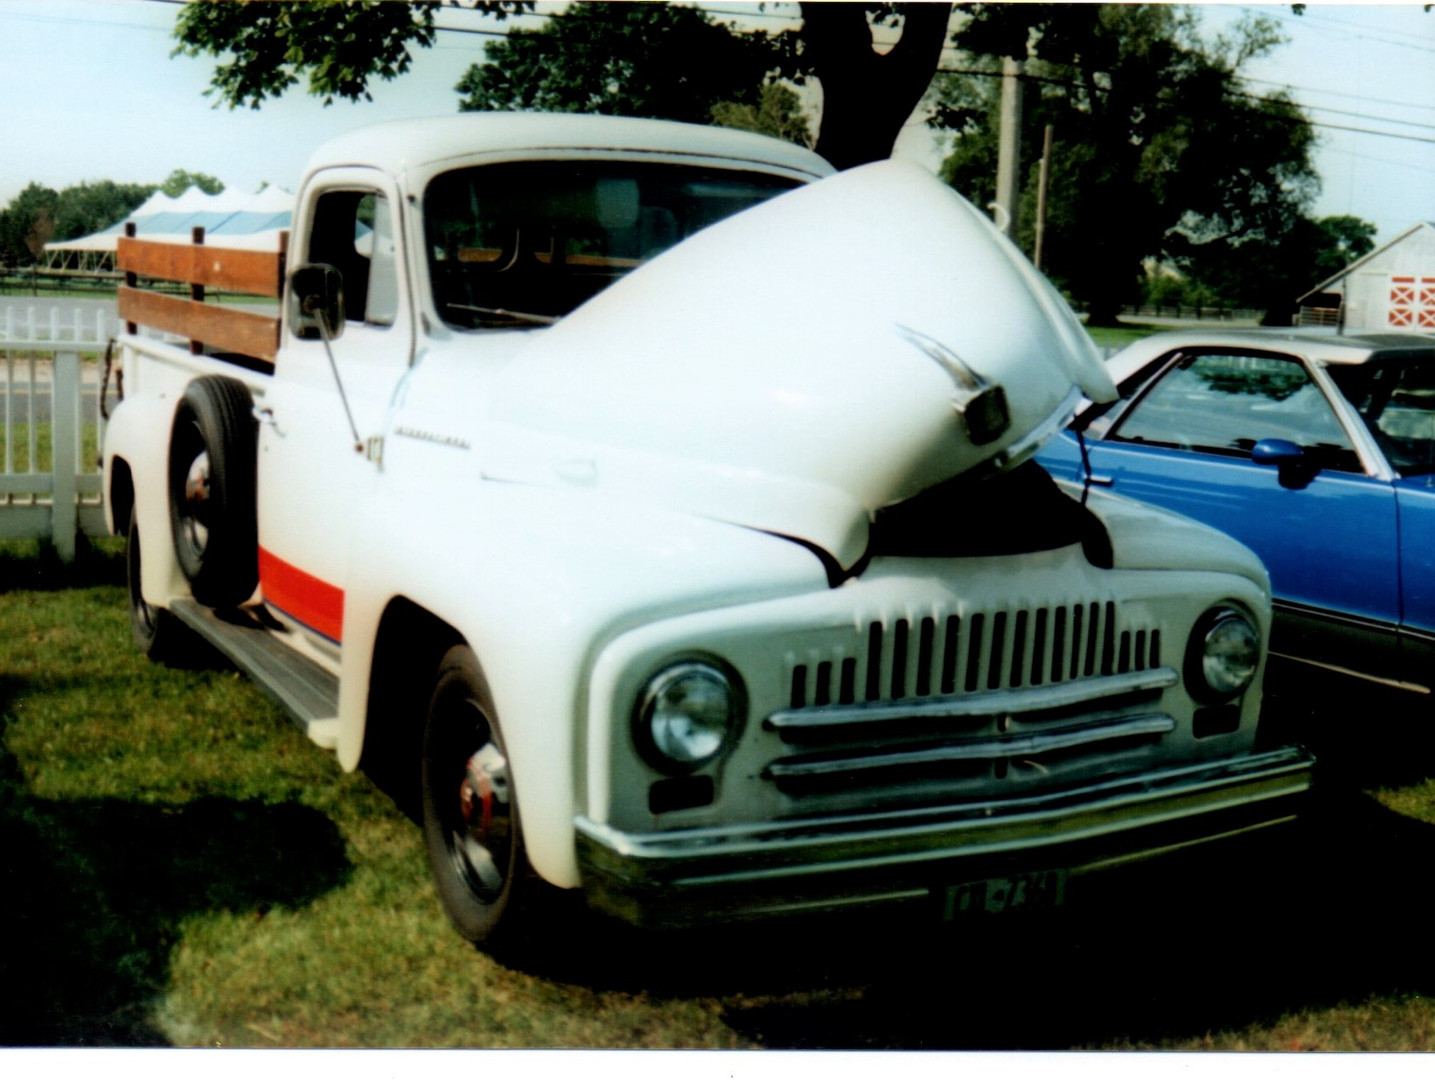 1952 International L-120 pickup